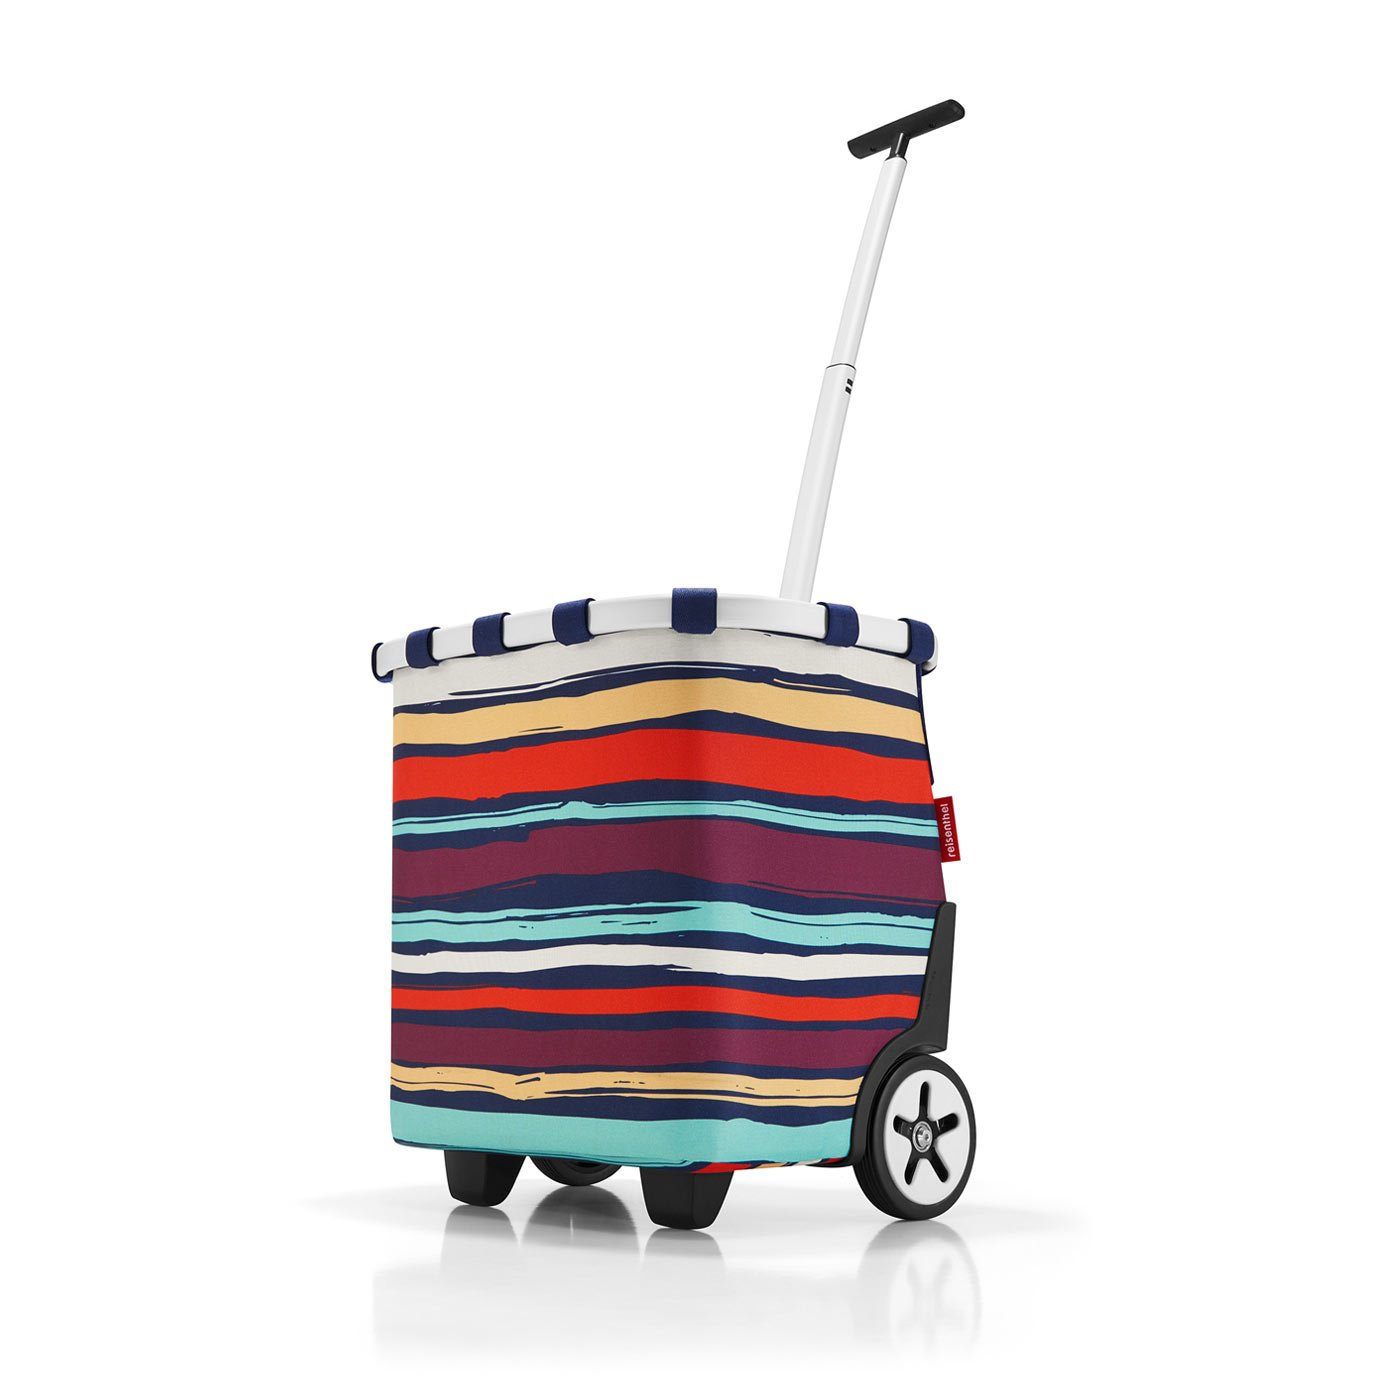 reisenthel Carrycruiser Shopping Trolley, Artist Stripes by reisenthel (Image #1)